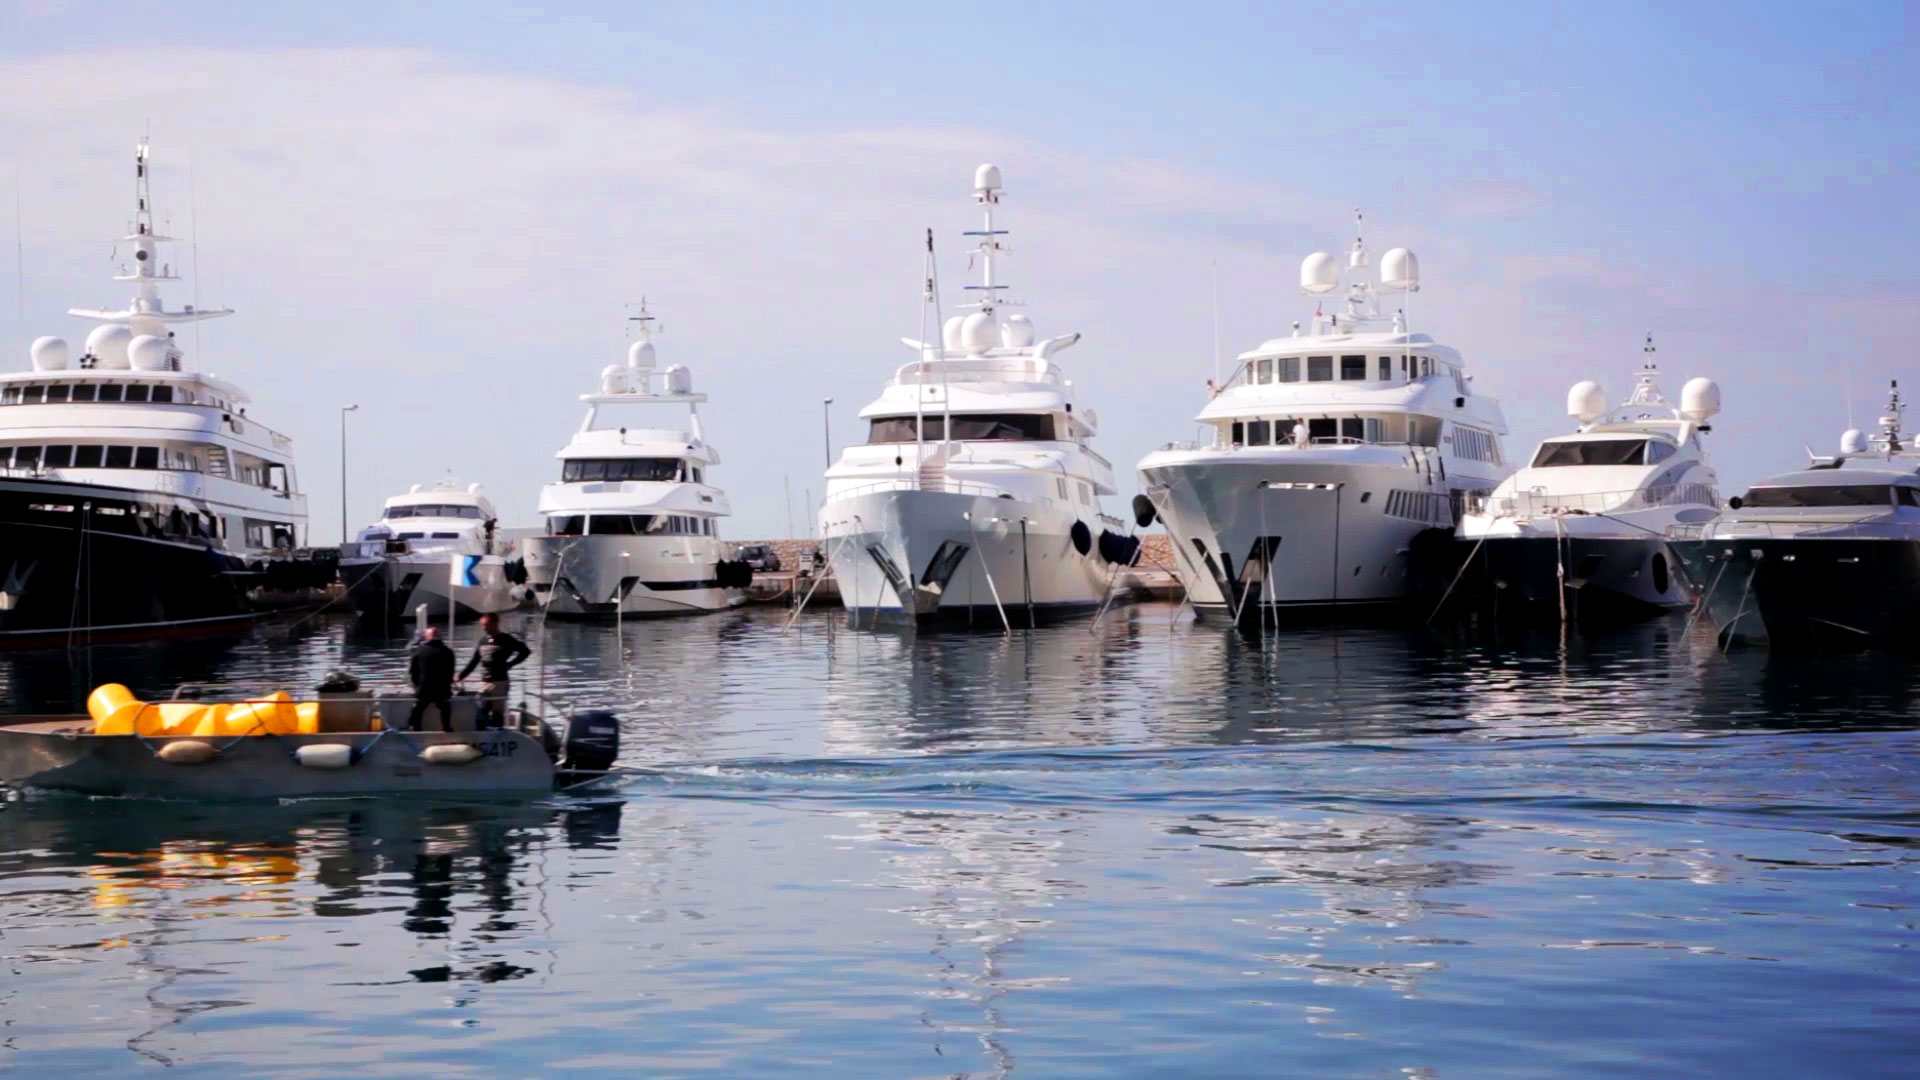 A harbour boat scene video